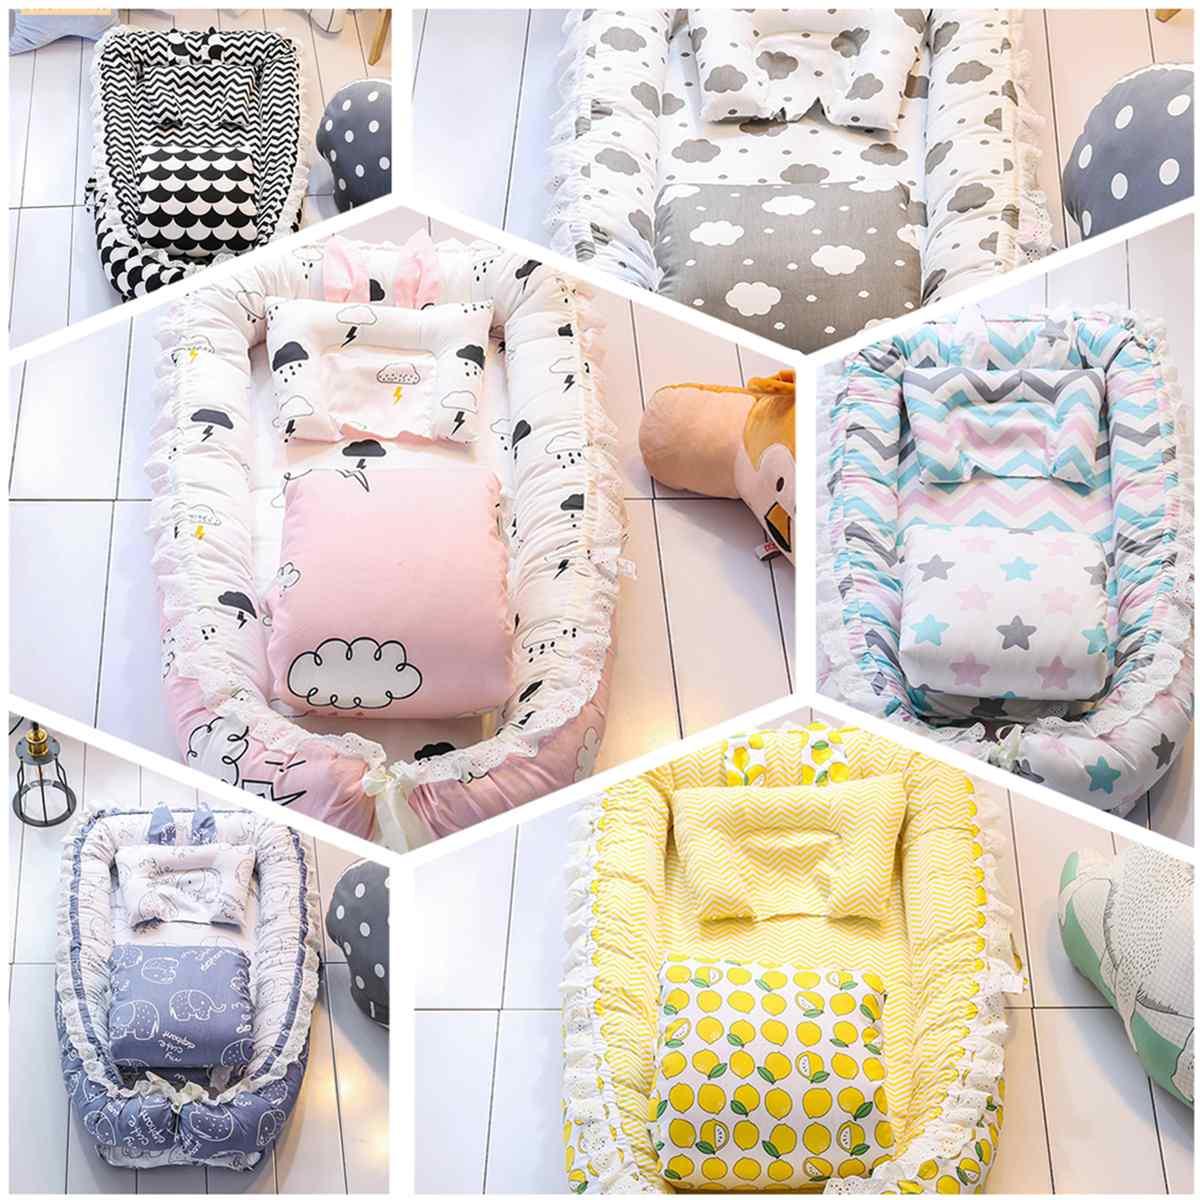 Cotton Sleeping Crib Baby Sleep Nest Bed Pillow Boys Girls Breathable Newborn Baby Sleep Bed Portable Detachable Mattress